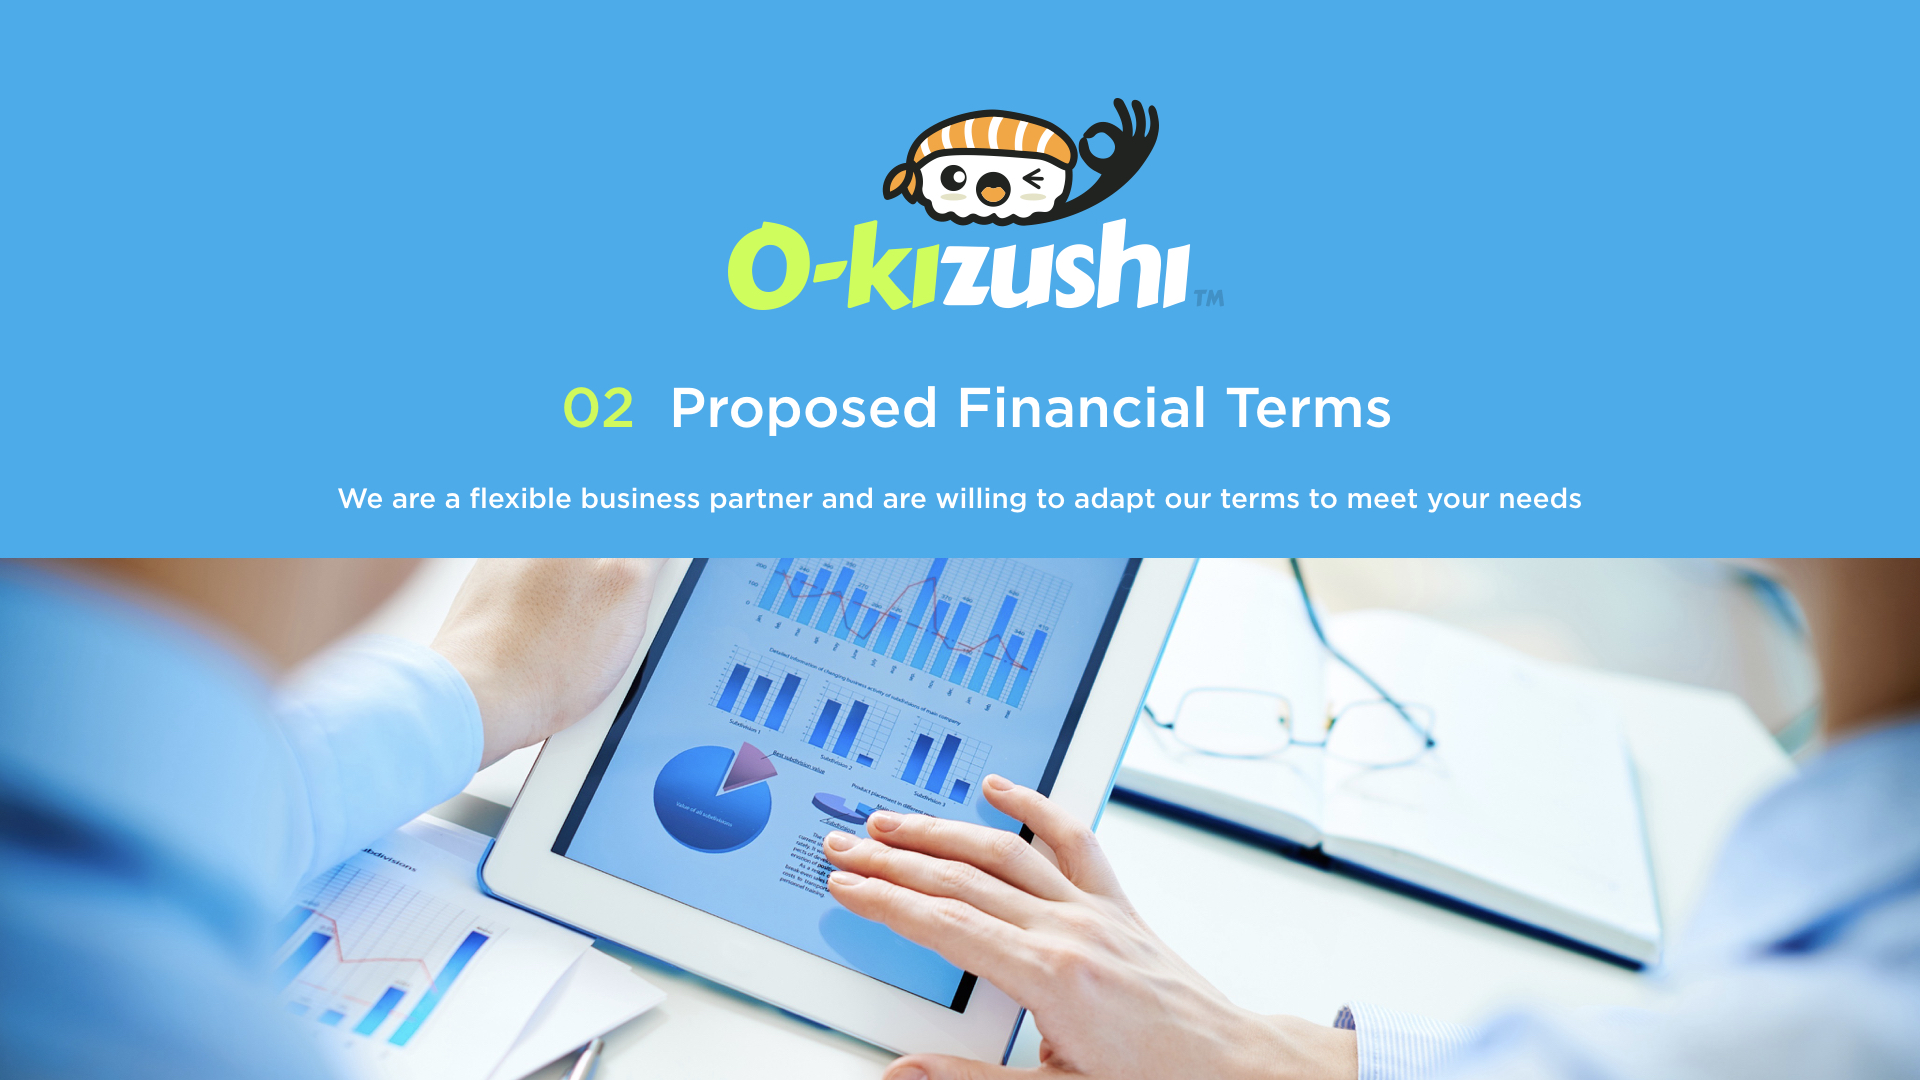 o-kizushi-proposal-mccs02.012.jpeg